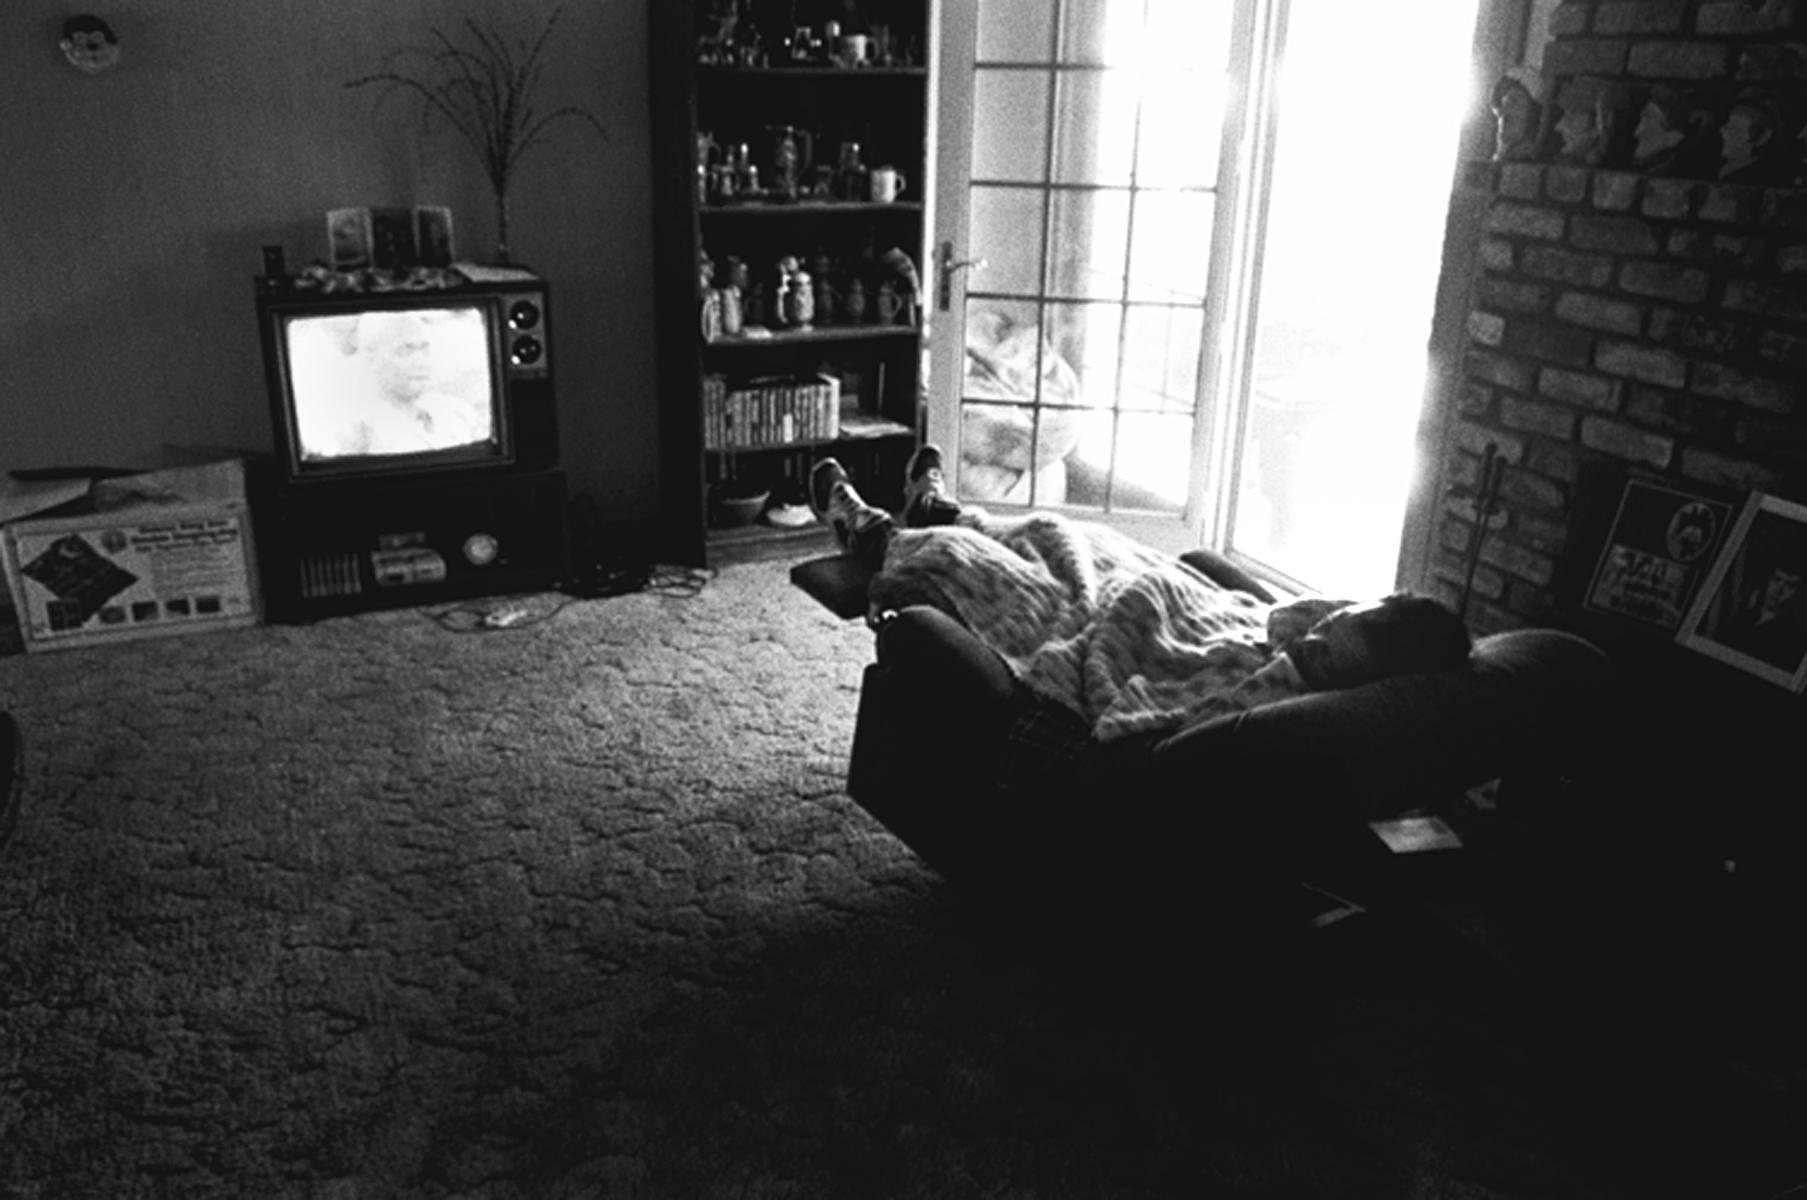 006-NS-LEP-Man-Sleeping